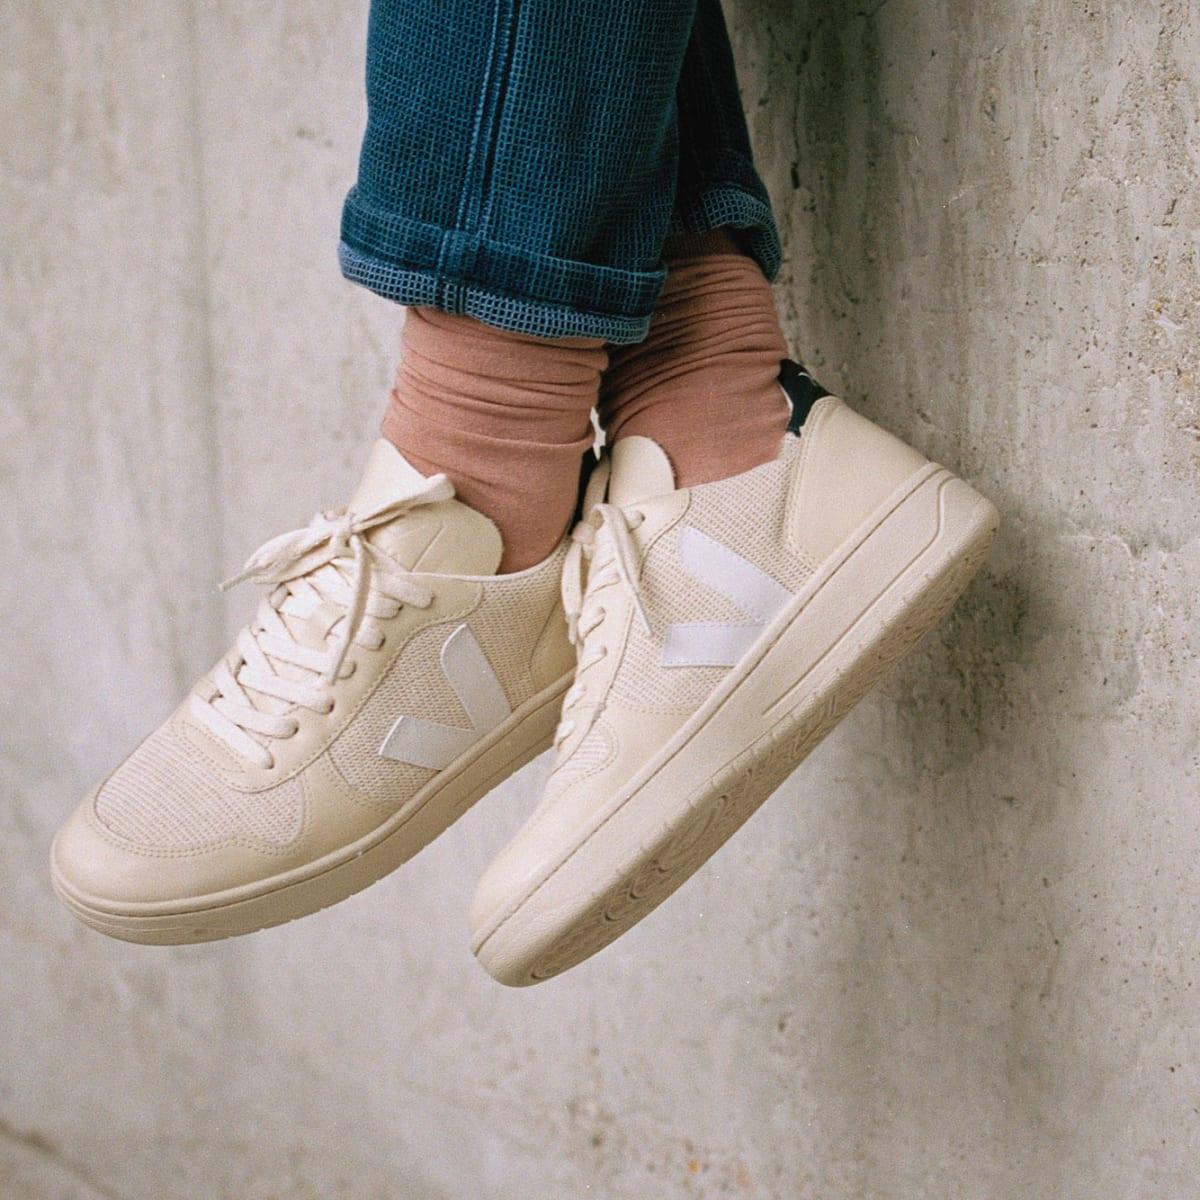 How Sneaker Brand Veja is Making it